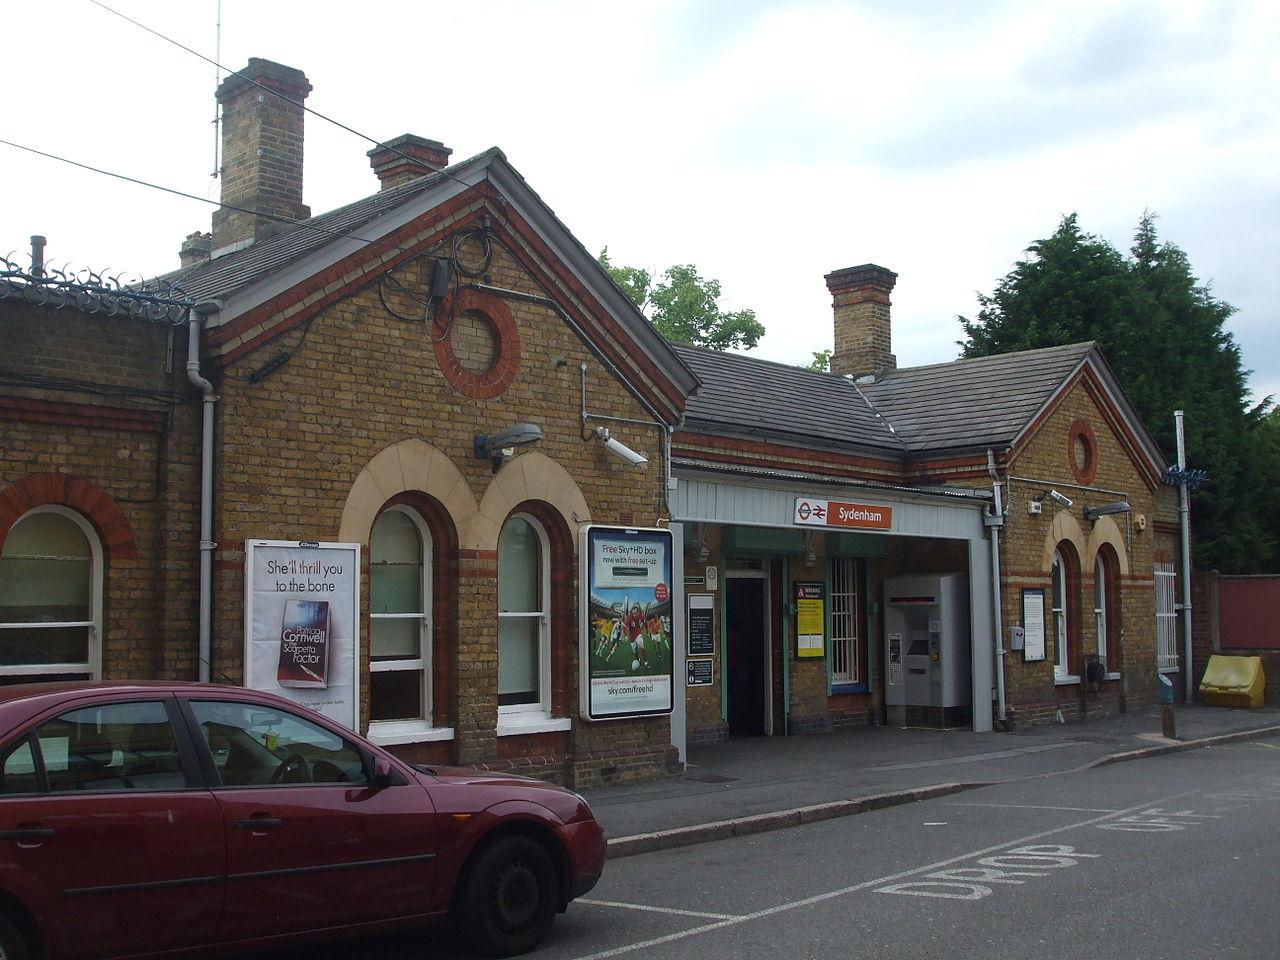 1280px-Sydenham_station_main_building_June_2010